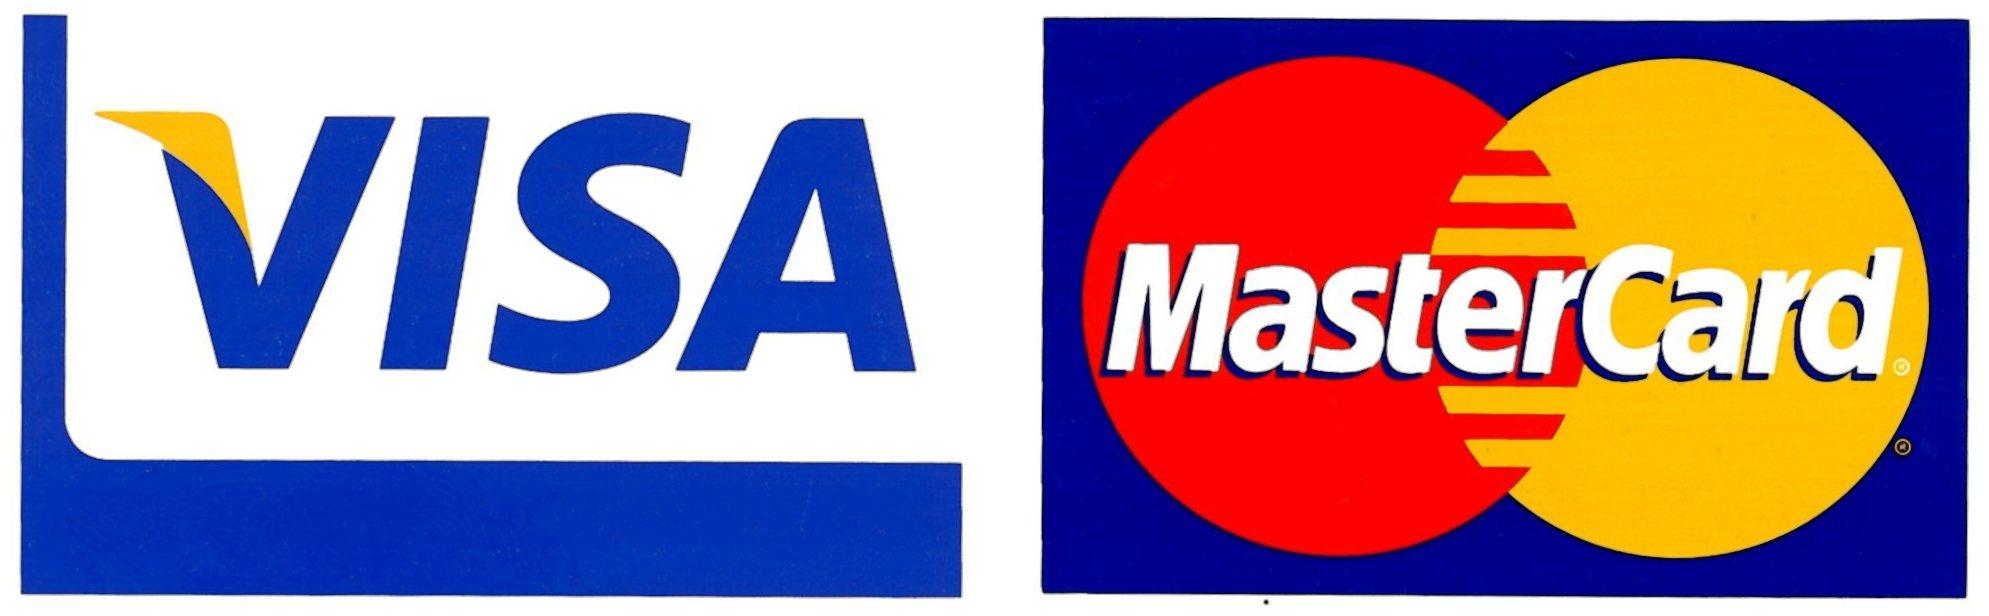 Visa mastercard logo clipart graphic freeuse stock Free Mastercard Cliparts, Download Free Clip Art, Free Clip ... graphic freeuse stock